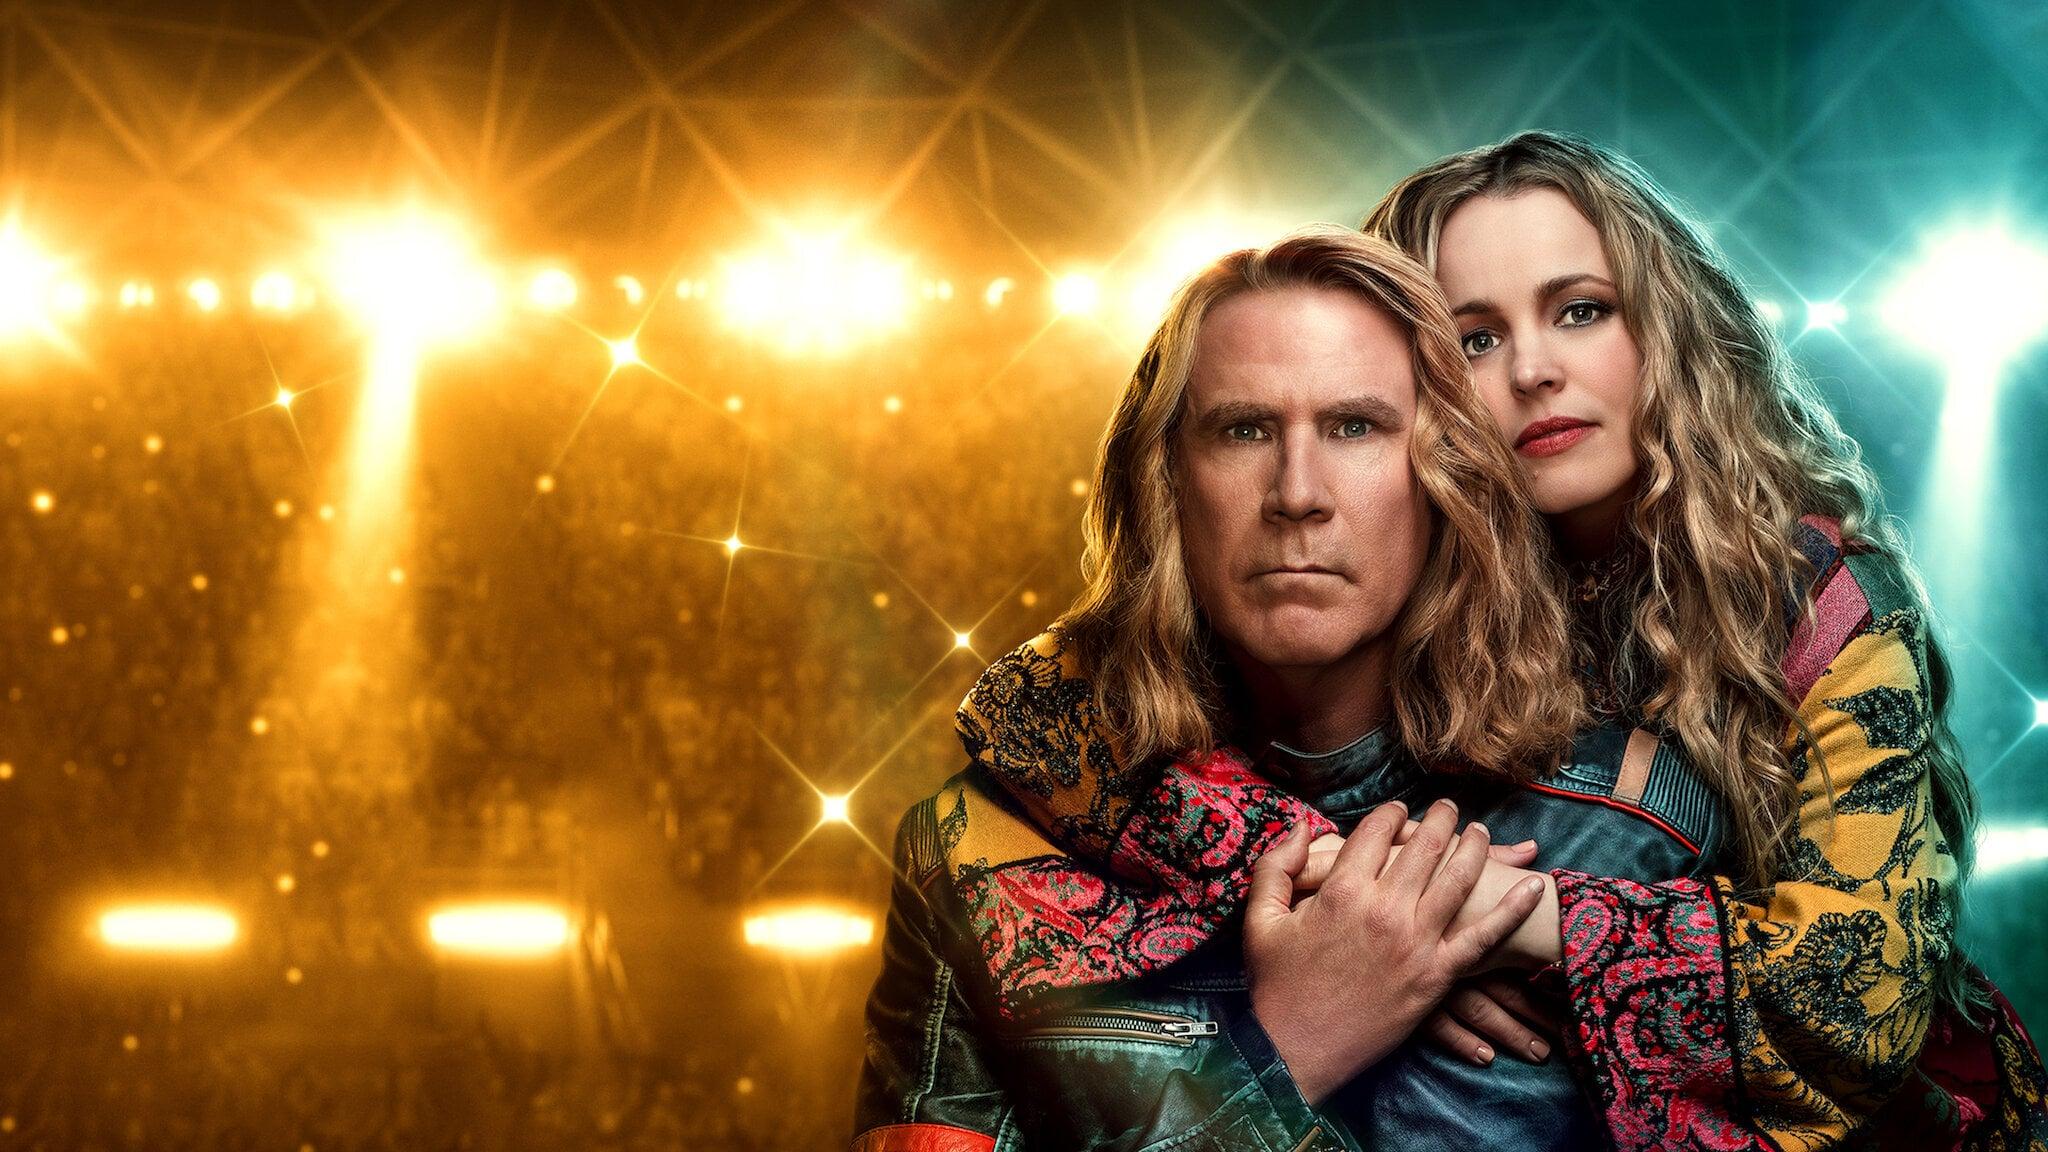 Dalban mondjuk el! – Eurovision Song Contest: The Story of Fire Saga – kritika